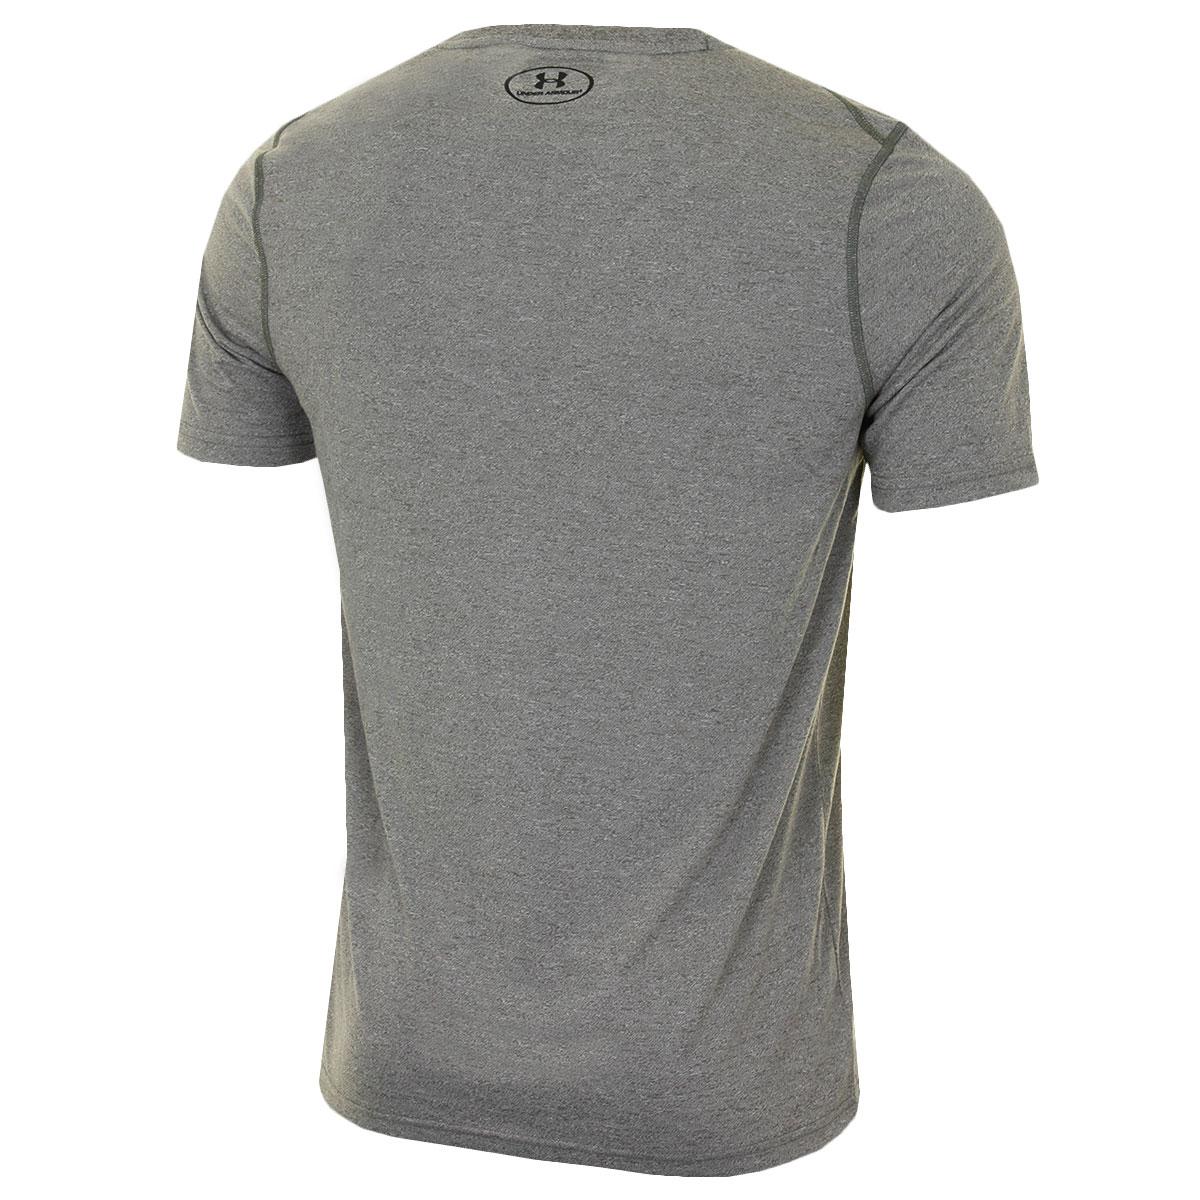 Under-Armour-Mens-UA-Threadborne-Fitted-Short-Sleeve-Gym-Tee-Sport-T-Shirt thumbnail 18